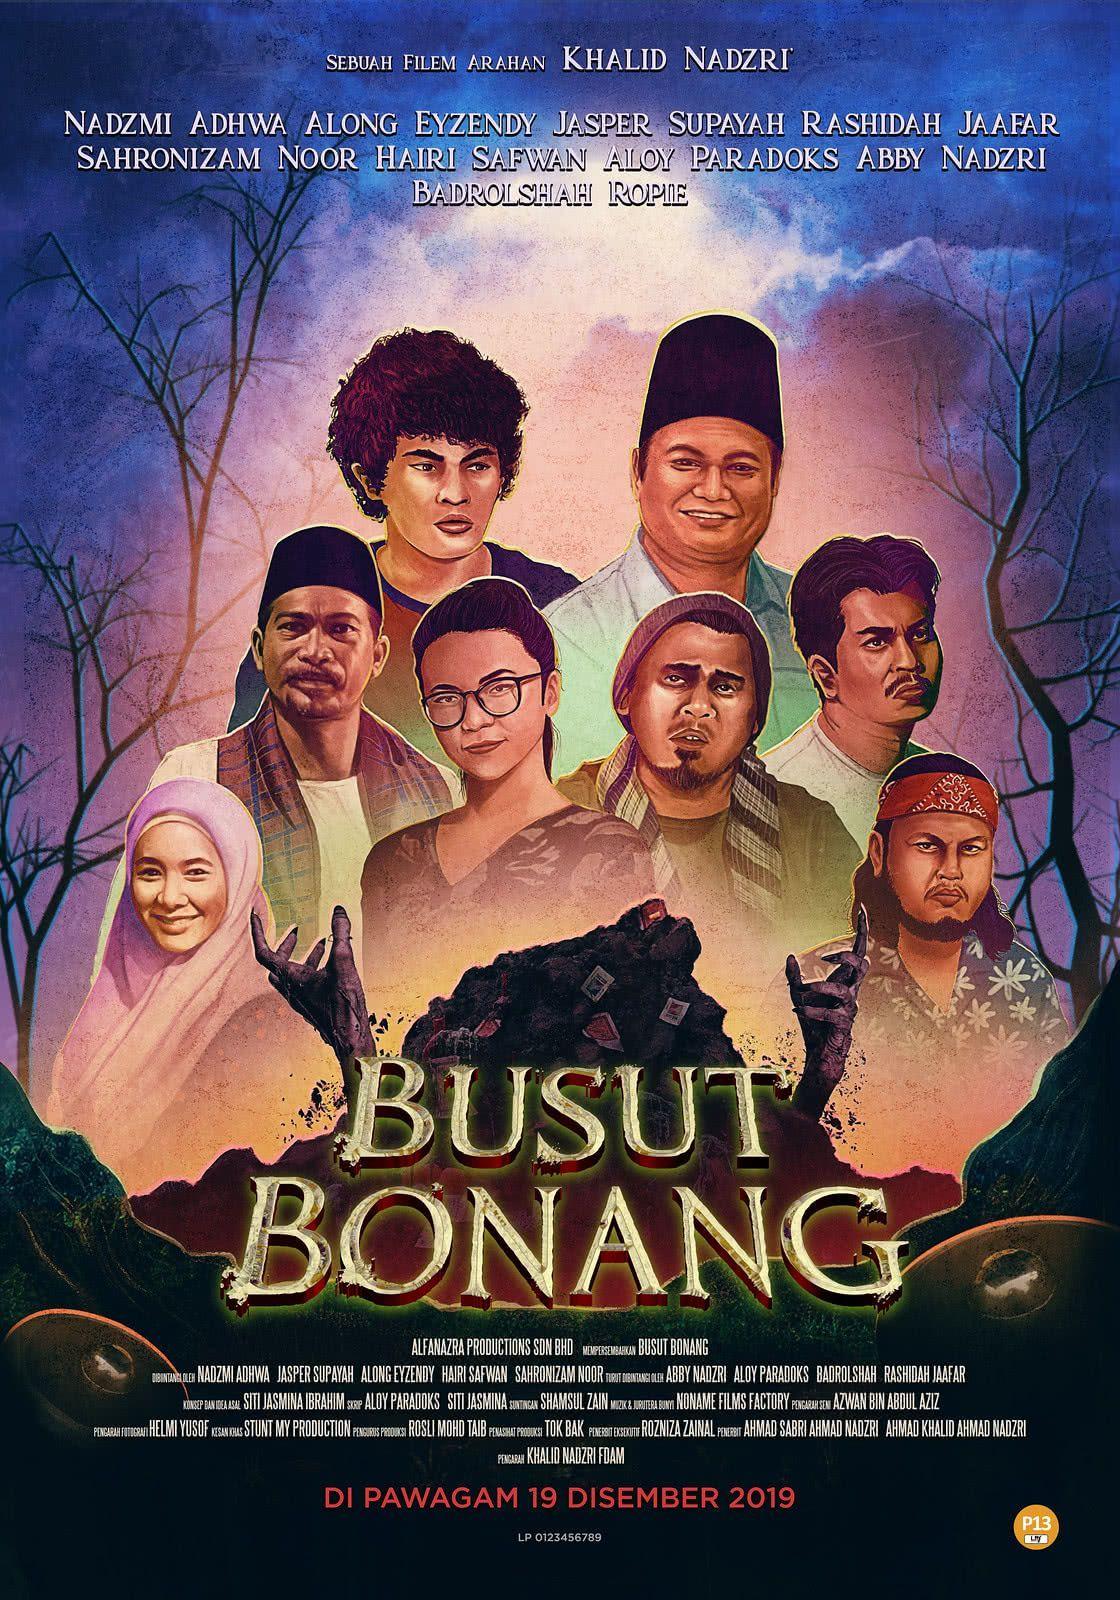 Poster Filem Busut Bonang